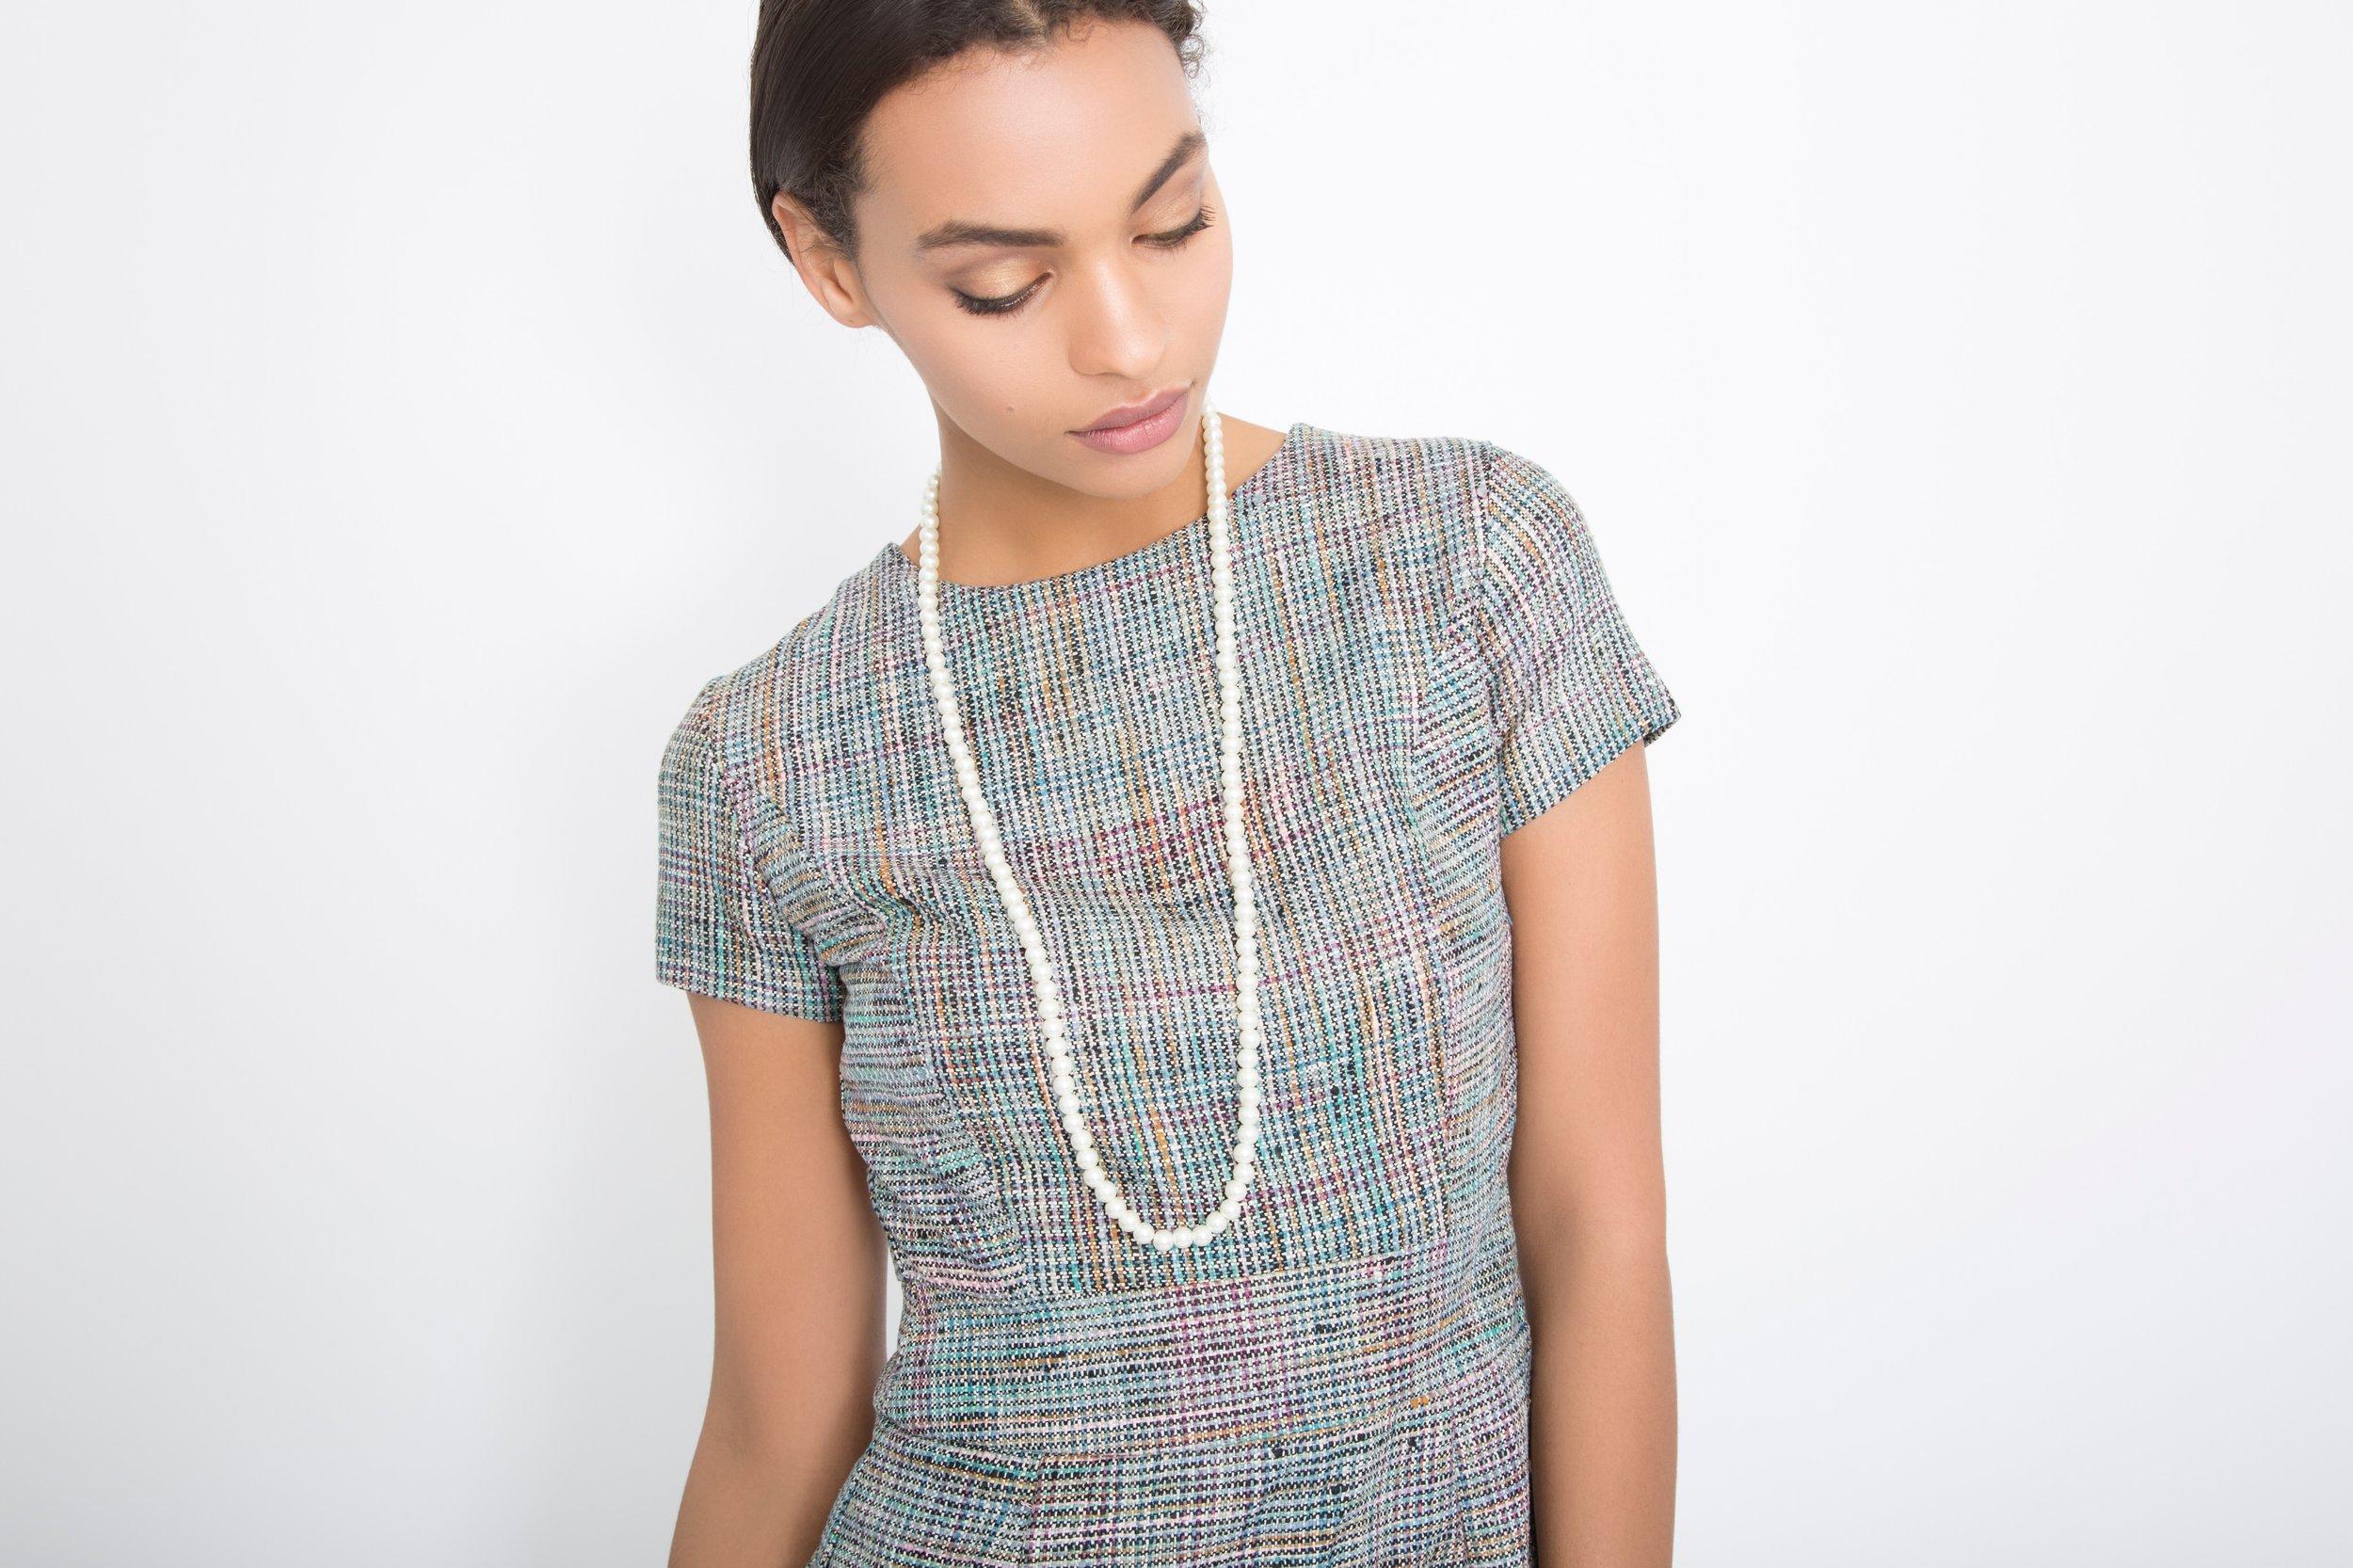 NATIA ERIN + Work Wear + The Tech Dress